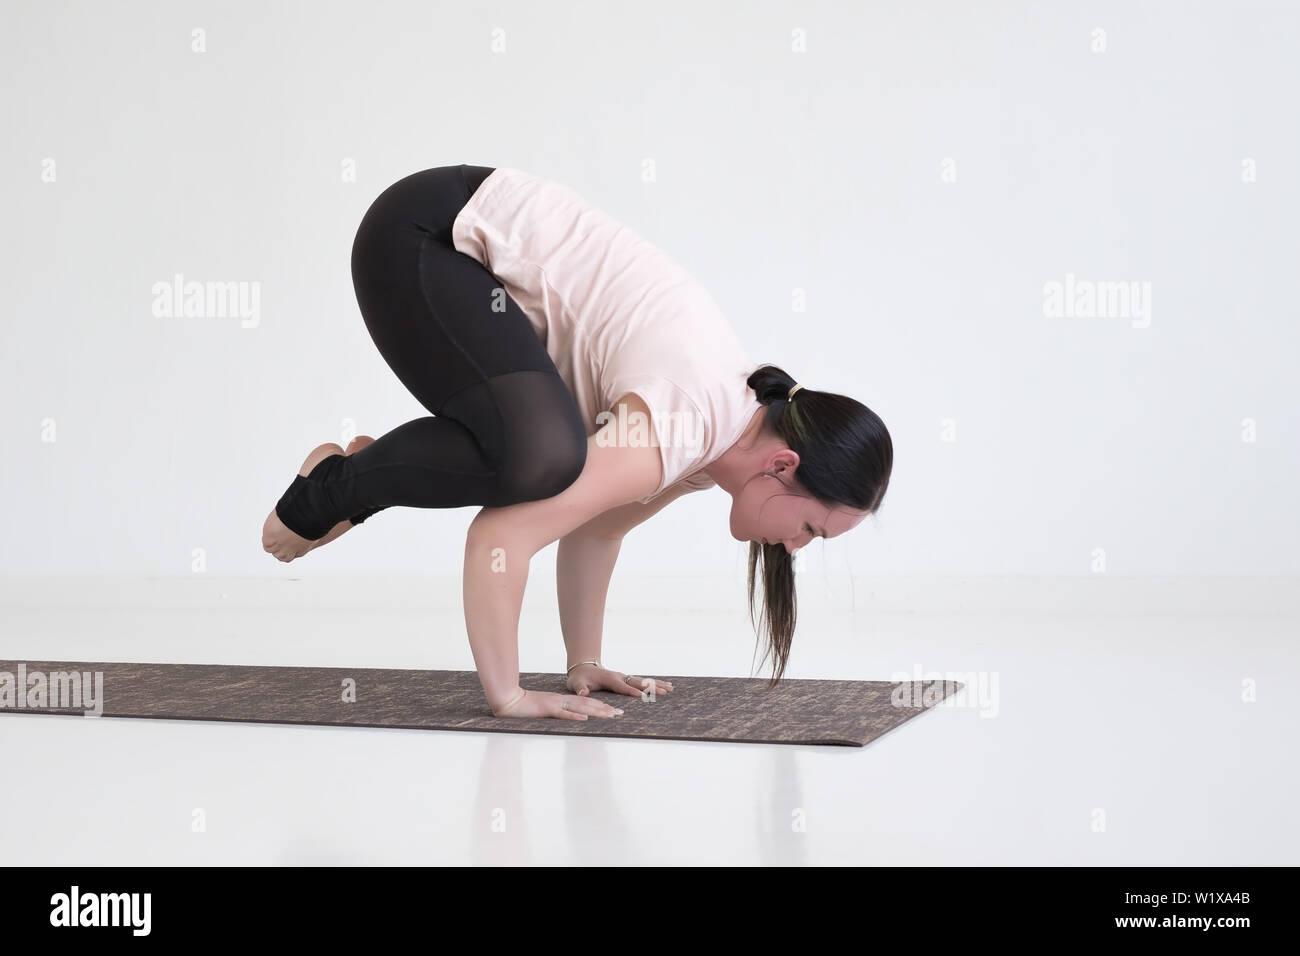 Young woman practicing yoga, doing Crane exercise, Bakasana pose - Stock Image